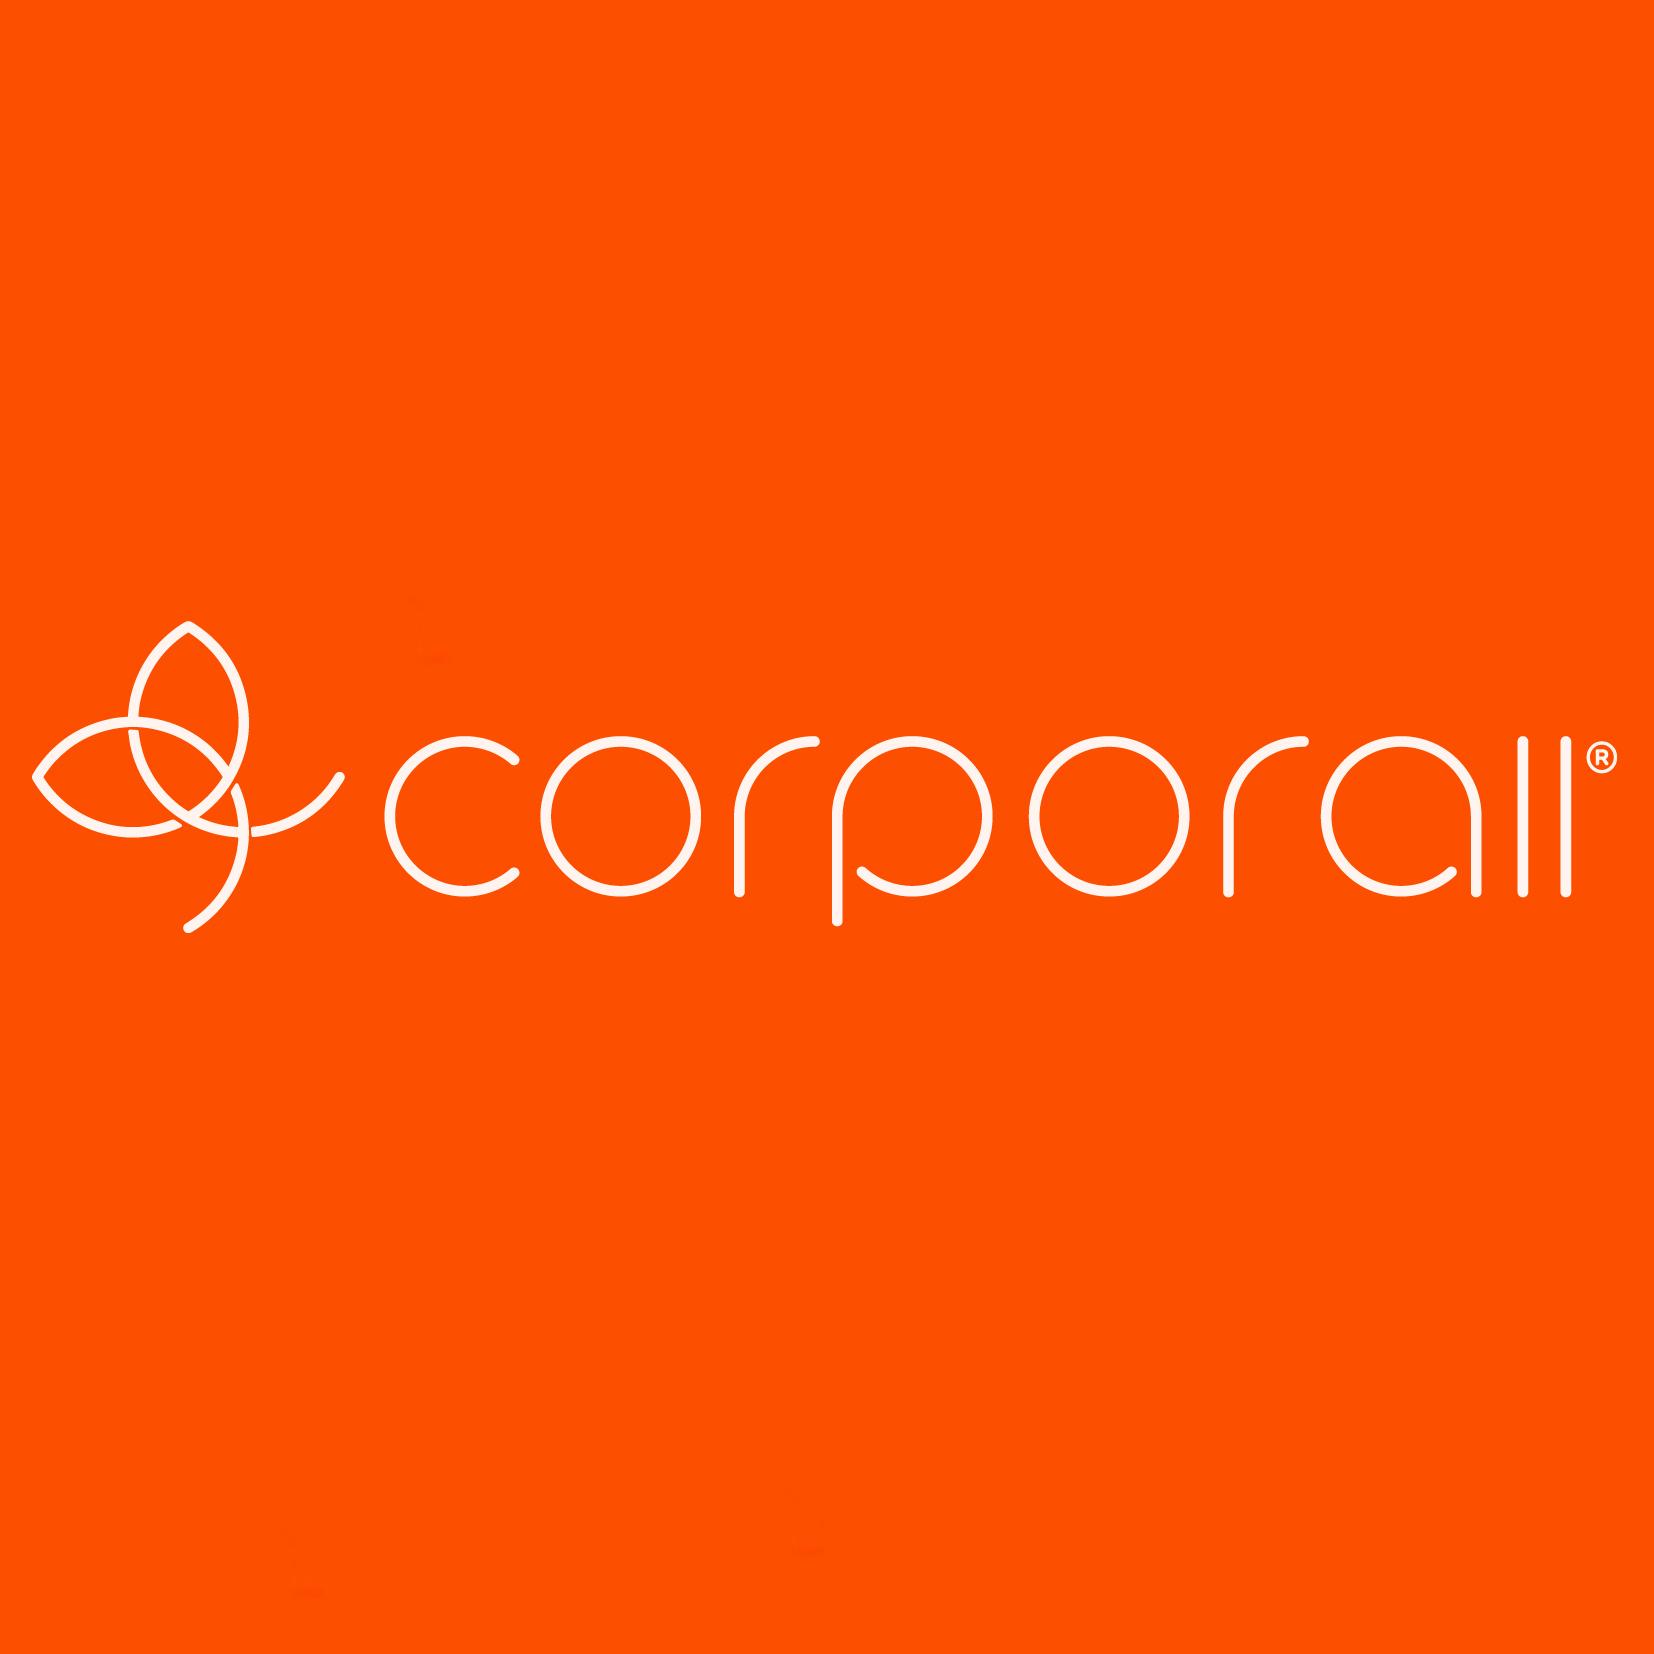 (c) Corporall.pt